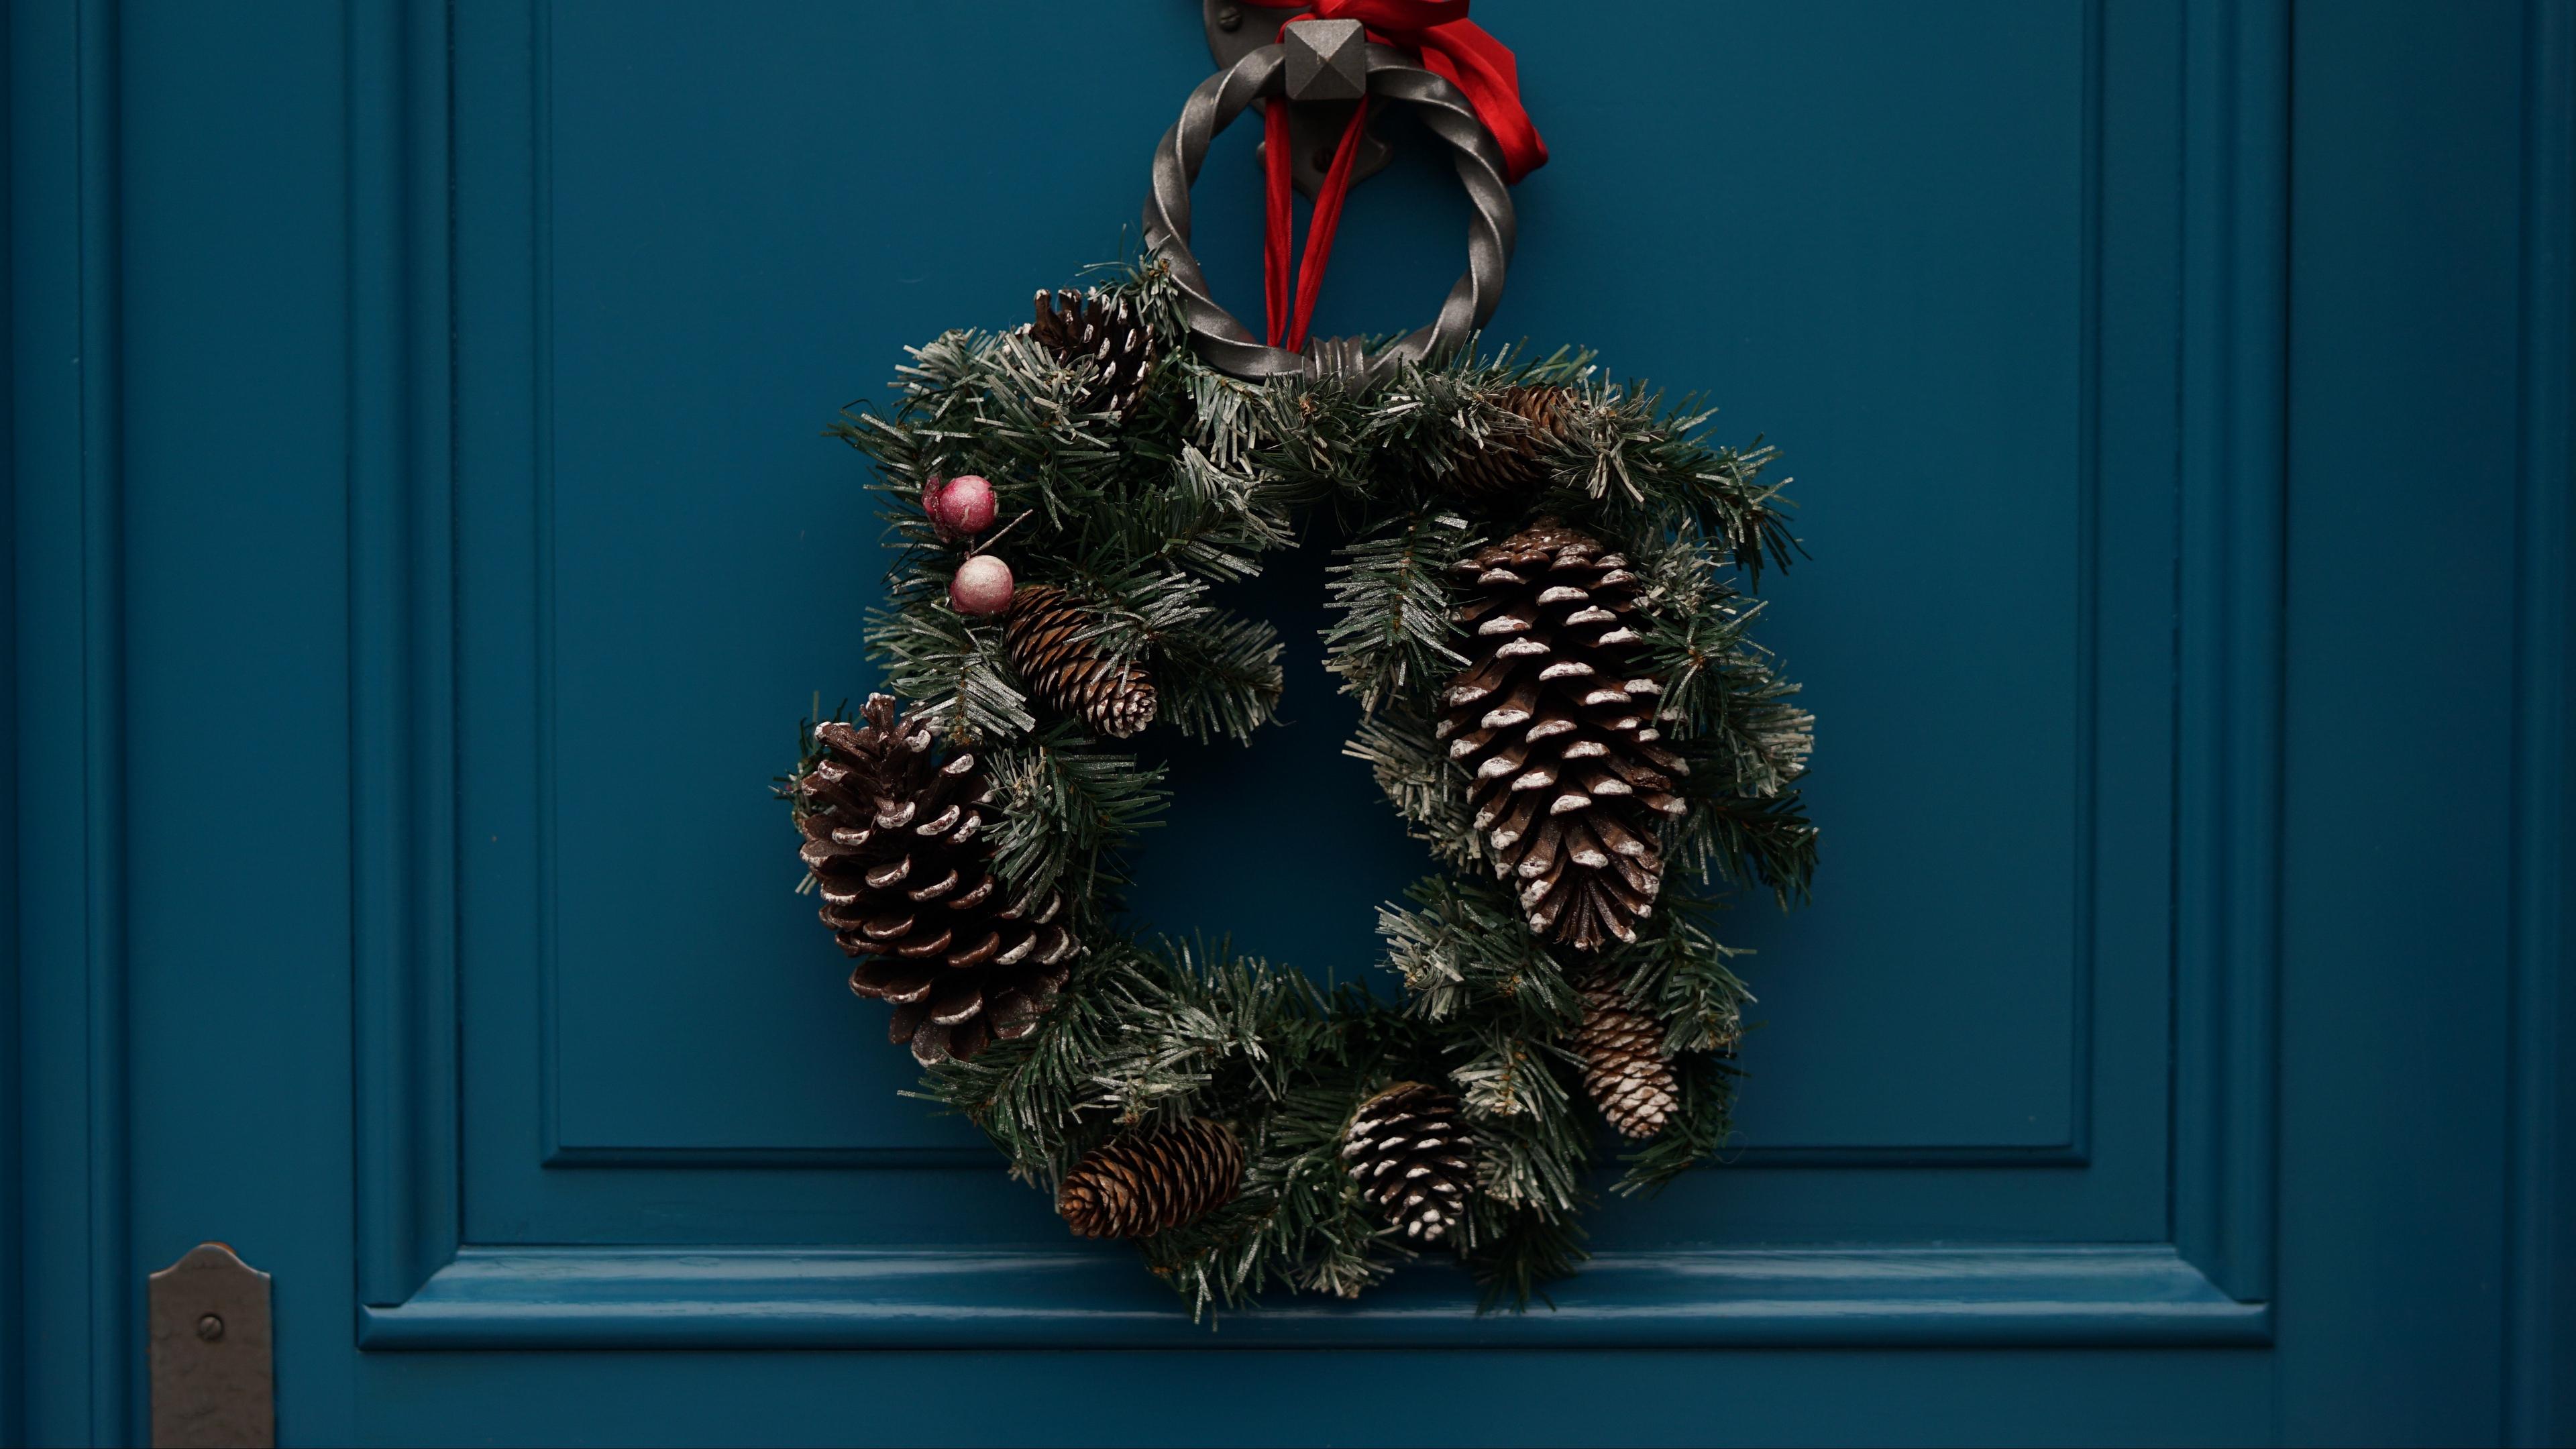 wreath flowers decoration christmas 4k 1538344959 - wreath, flowers, decoration, christmas 4k - wreath, Flowers, decoration